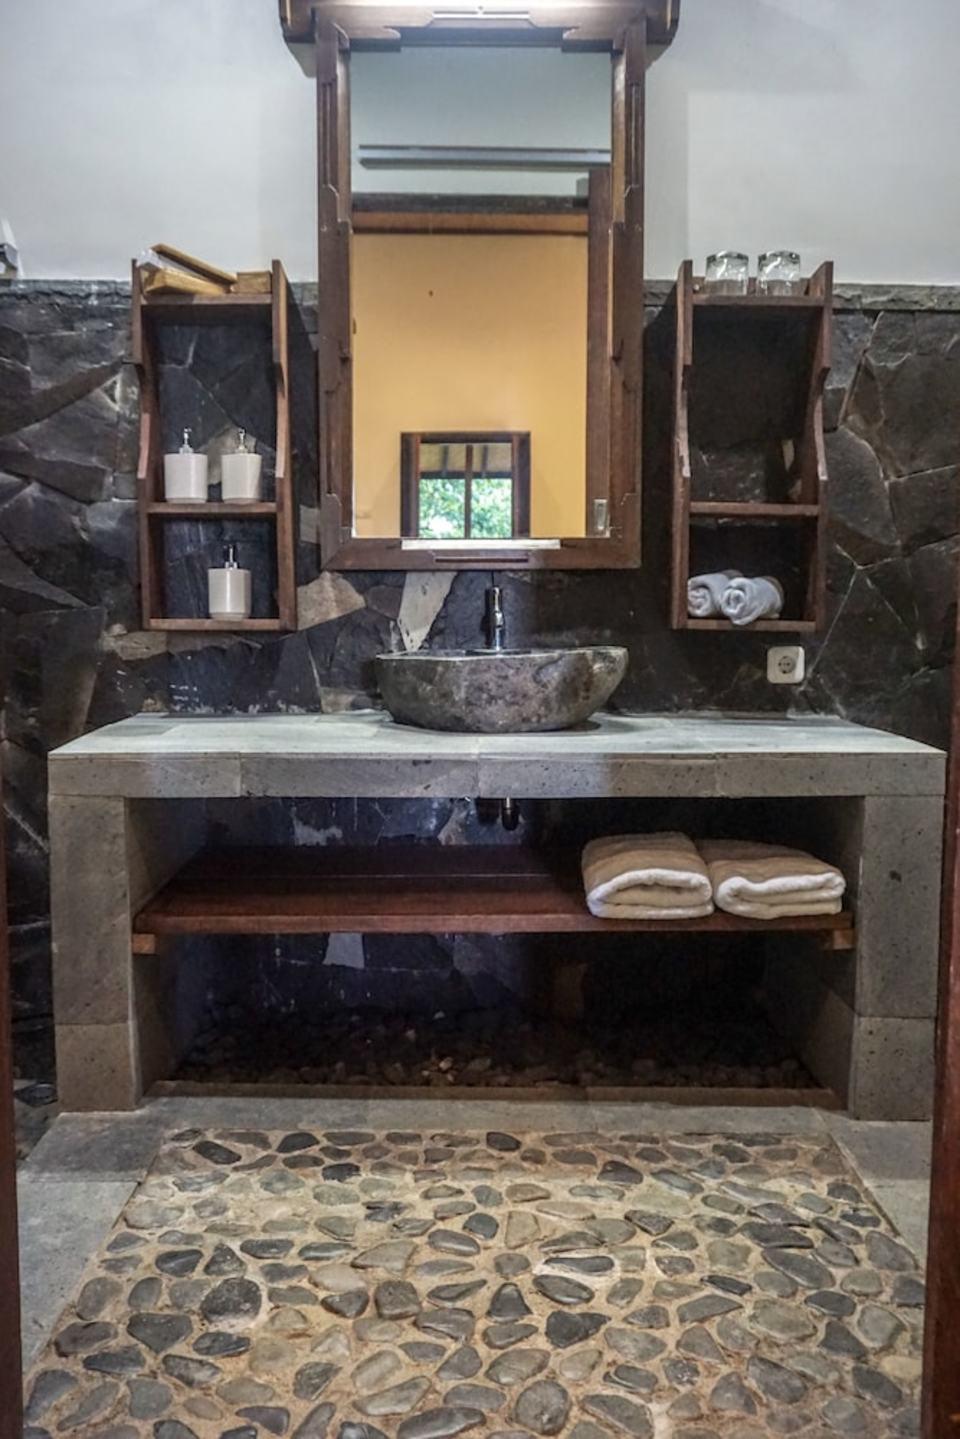 Swar Bali Lodge Bali - Bathroom Amenities